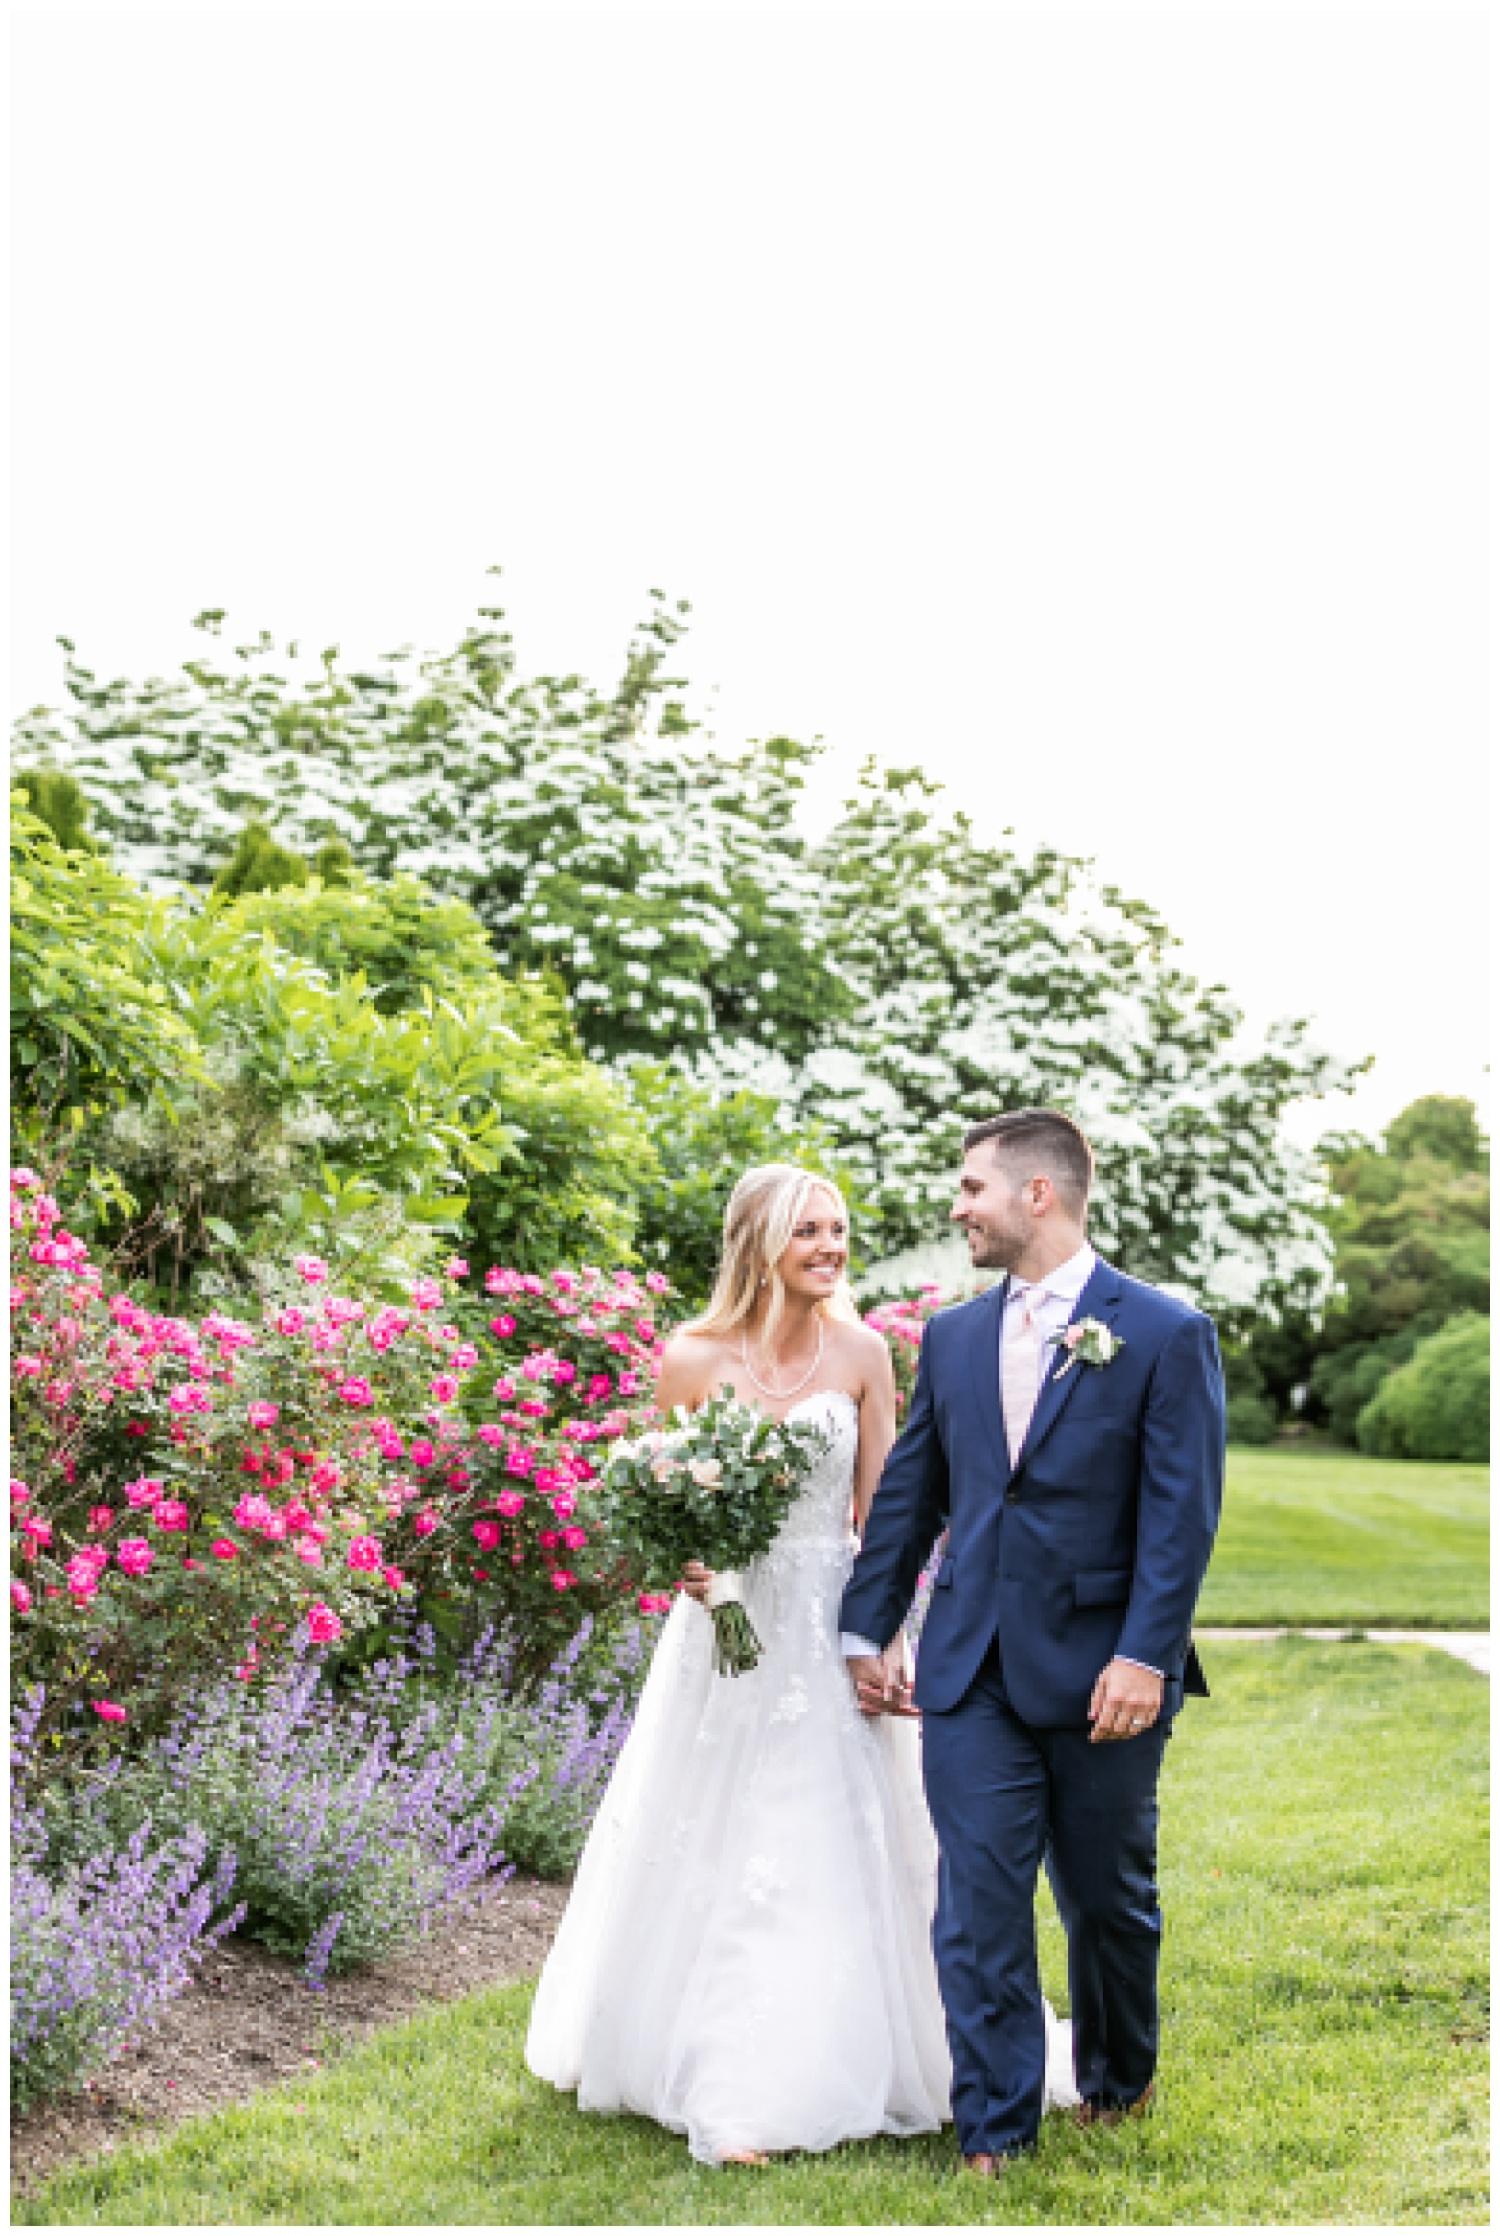 Kelly Mike Swan Harbor Farm Wedding Living Radiant Photography photos_0137.jpg